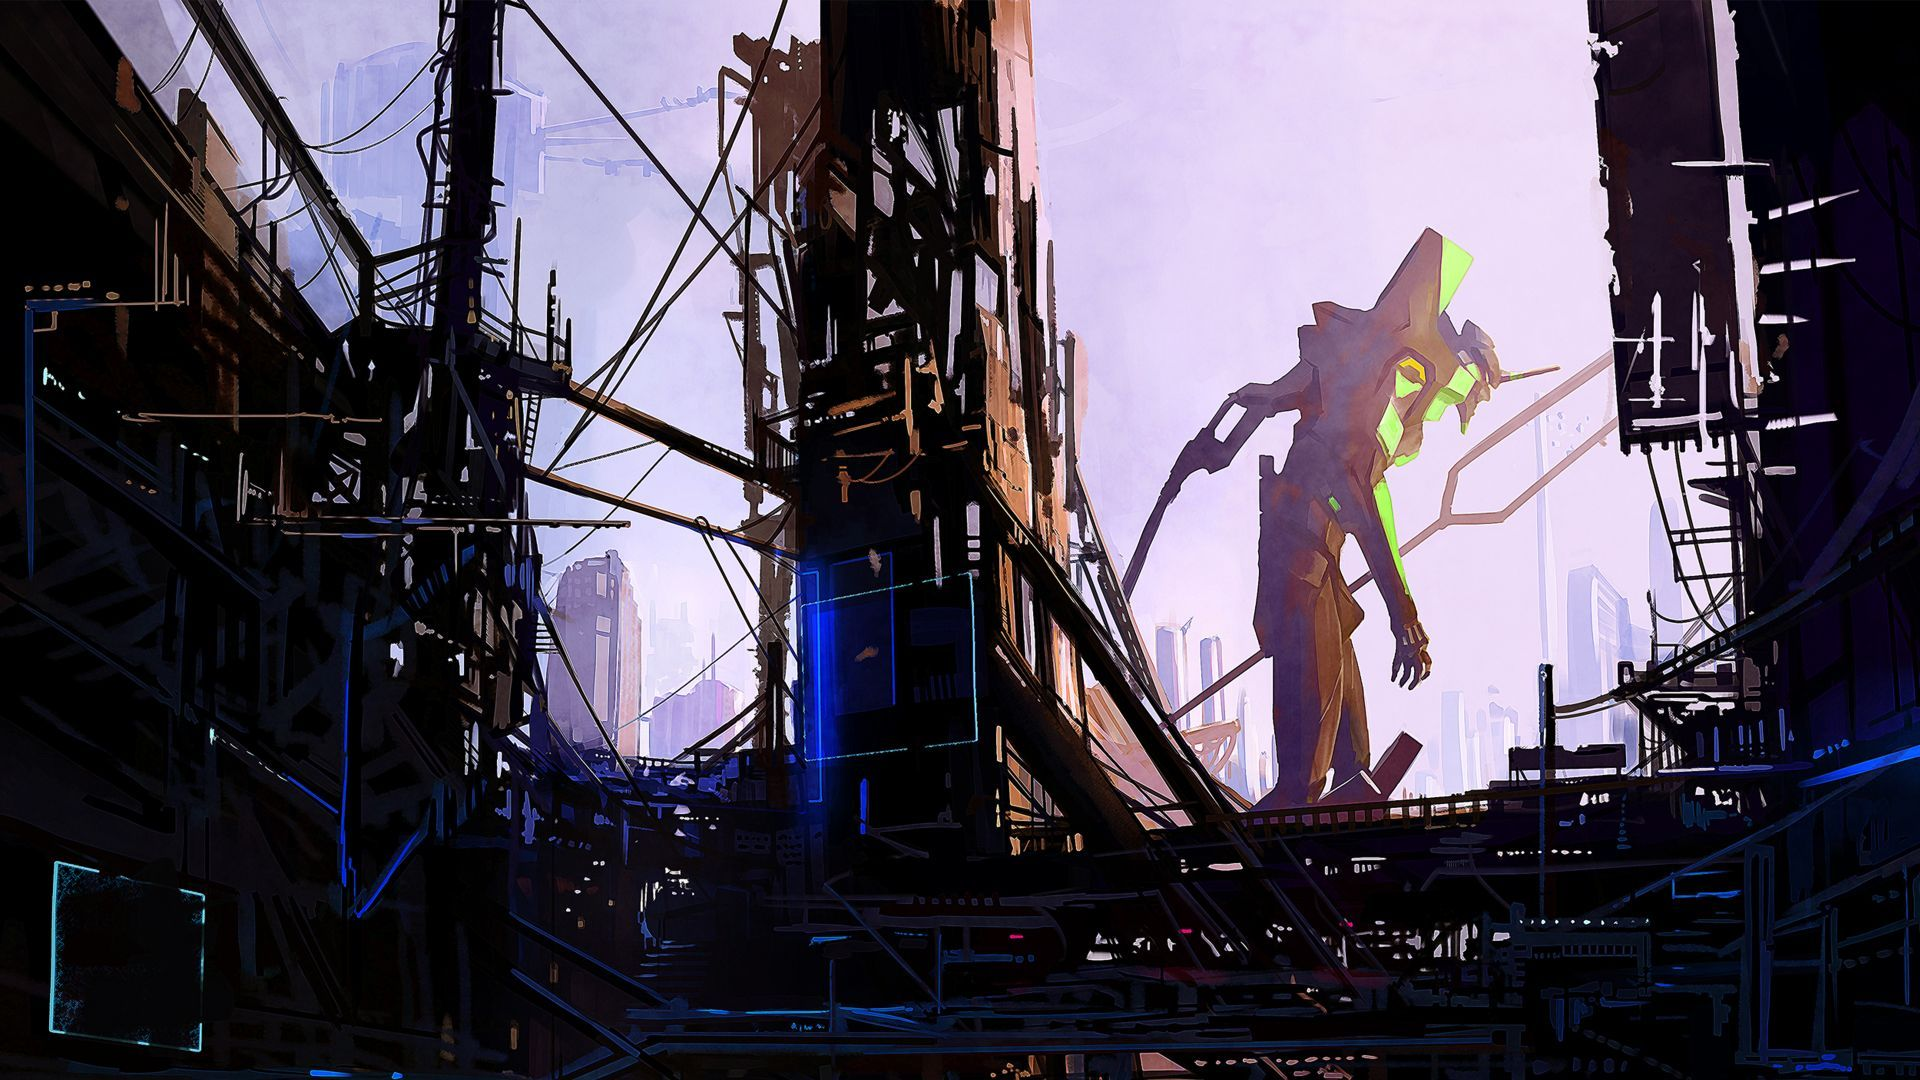 Robot City 4k Horizontal Neon Genesis Evangelion Evangelion Background Images